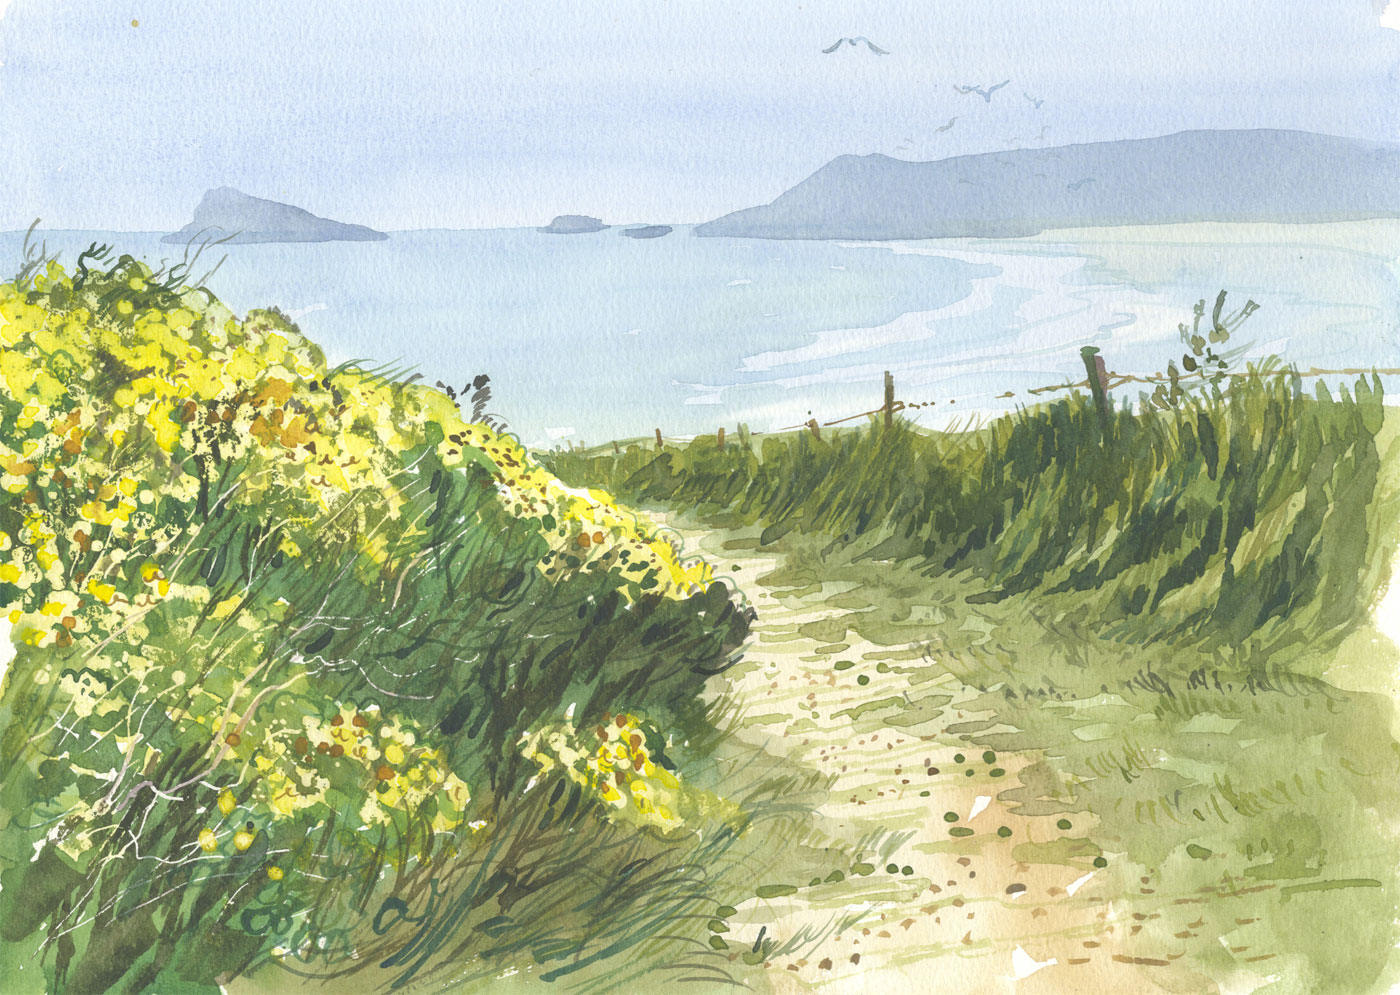 Robert T. Blayney (1929-2016) - Mid 20th Century Watercolour, Towards the Beach